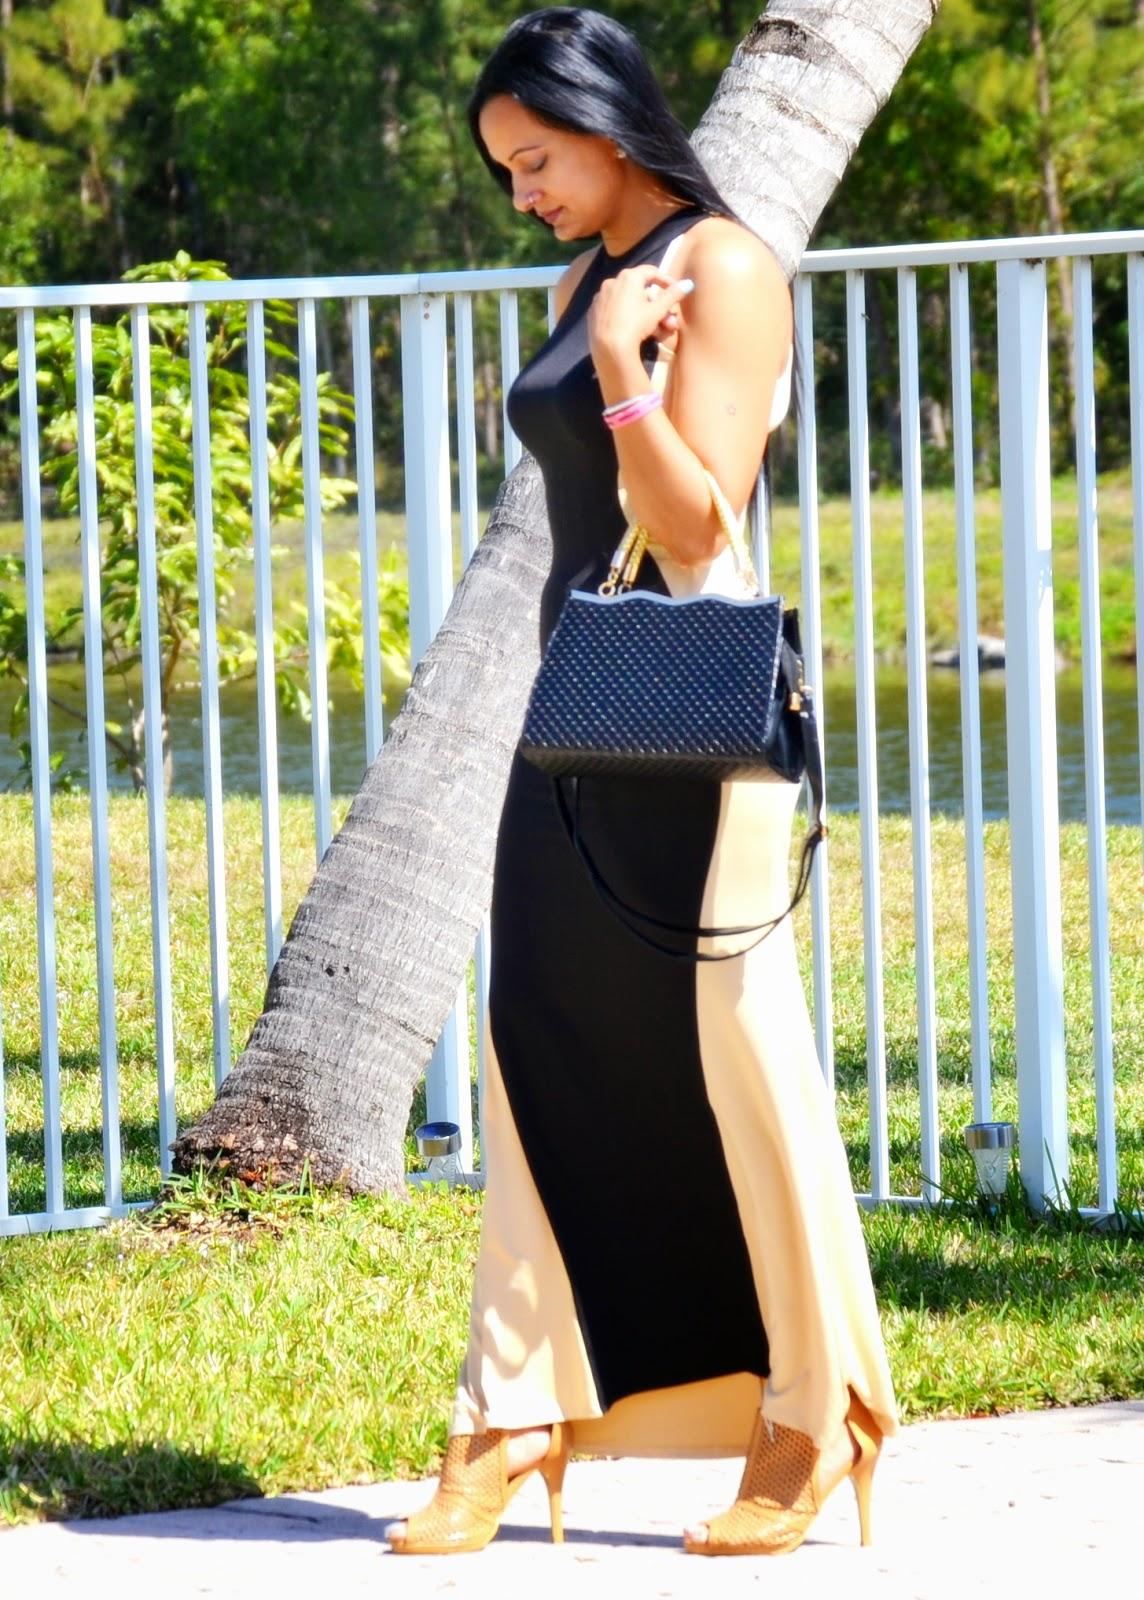 Halter Two-tone Evening Dress handbag oasap www.sandysandhu.co